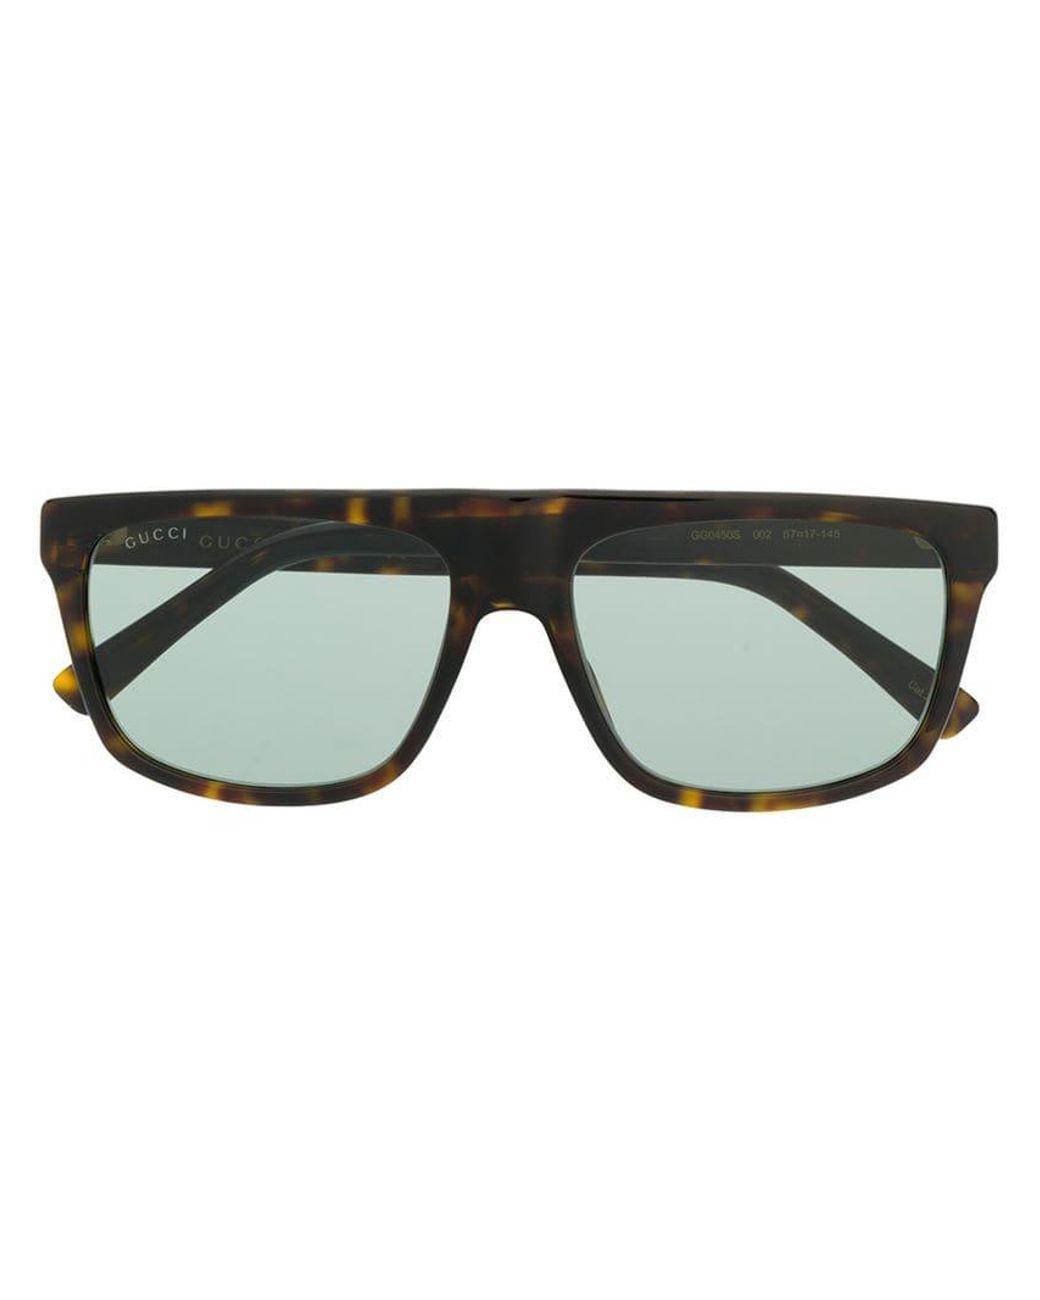 5b2e71066c95d Gucci Tortoiseshell Square Frame Sunglasses in Brown for Men - Lyst